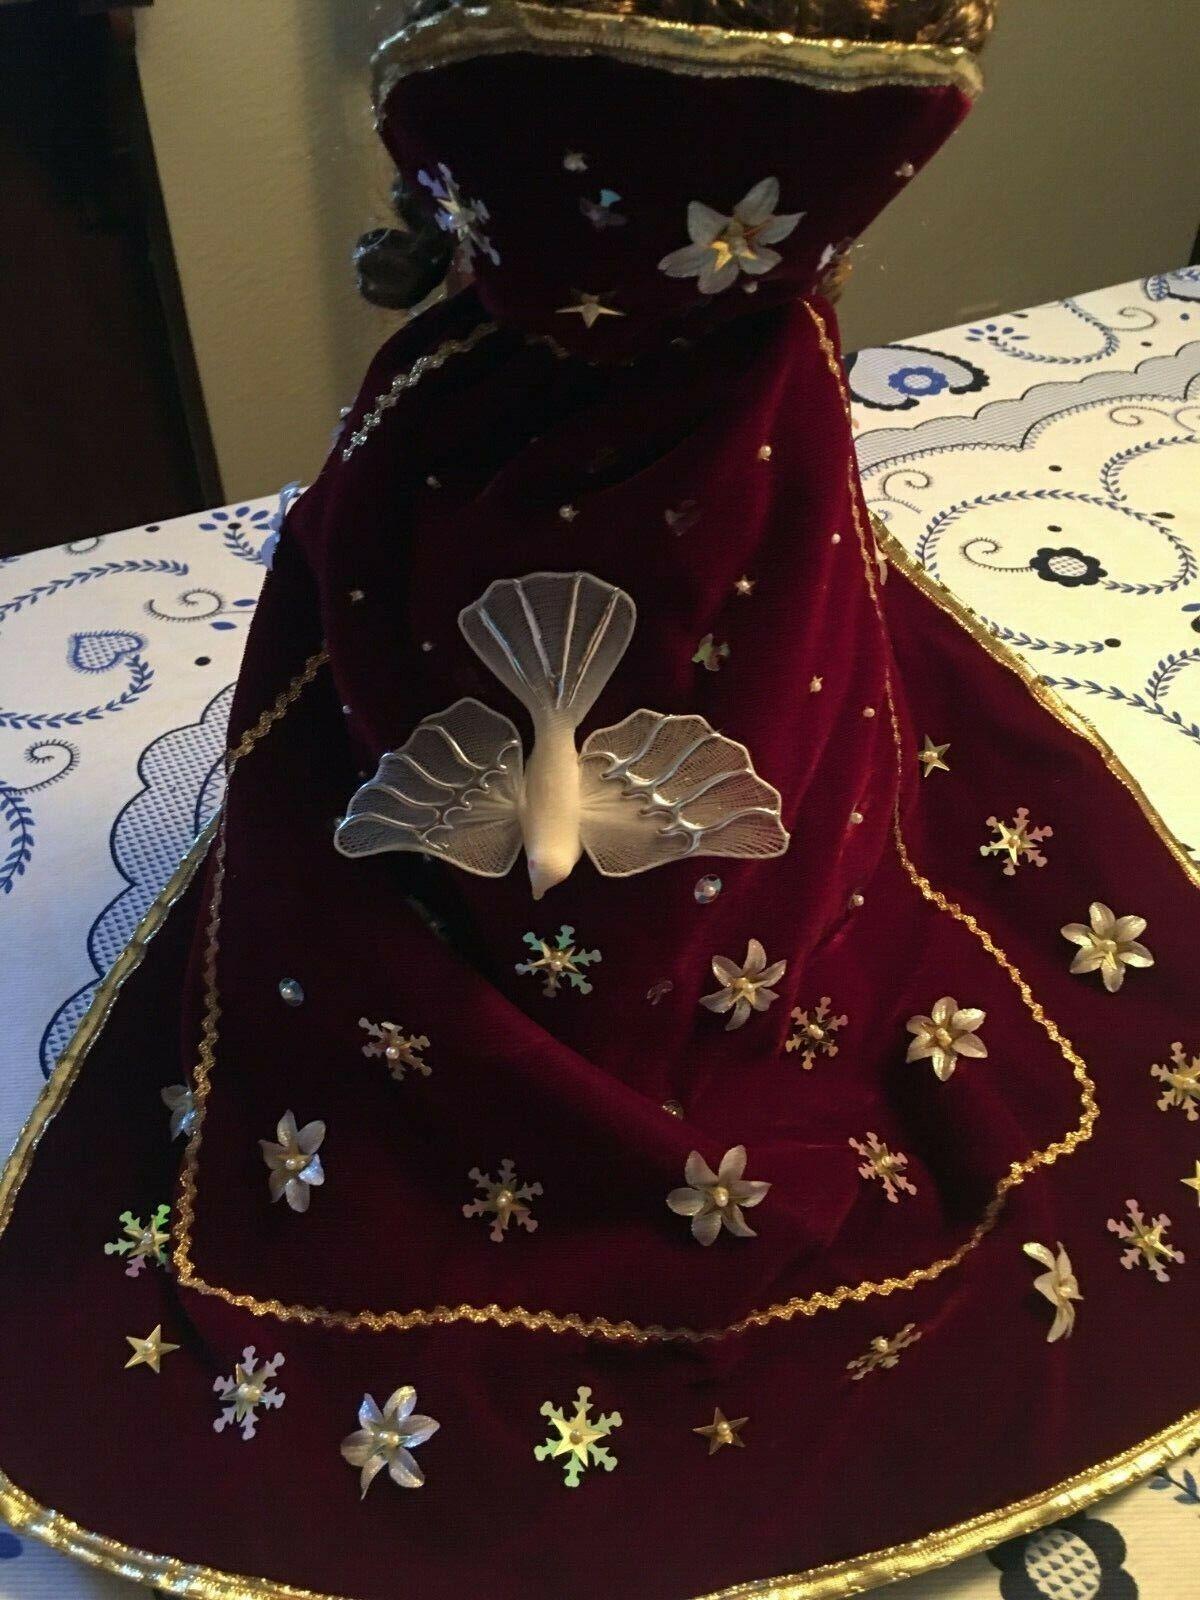 Raro portugués Espíritu Santo Ghost  Reina Muñeco  Festas  hecho a mano Cape